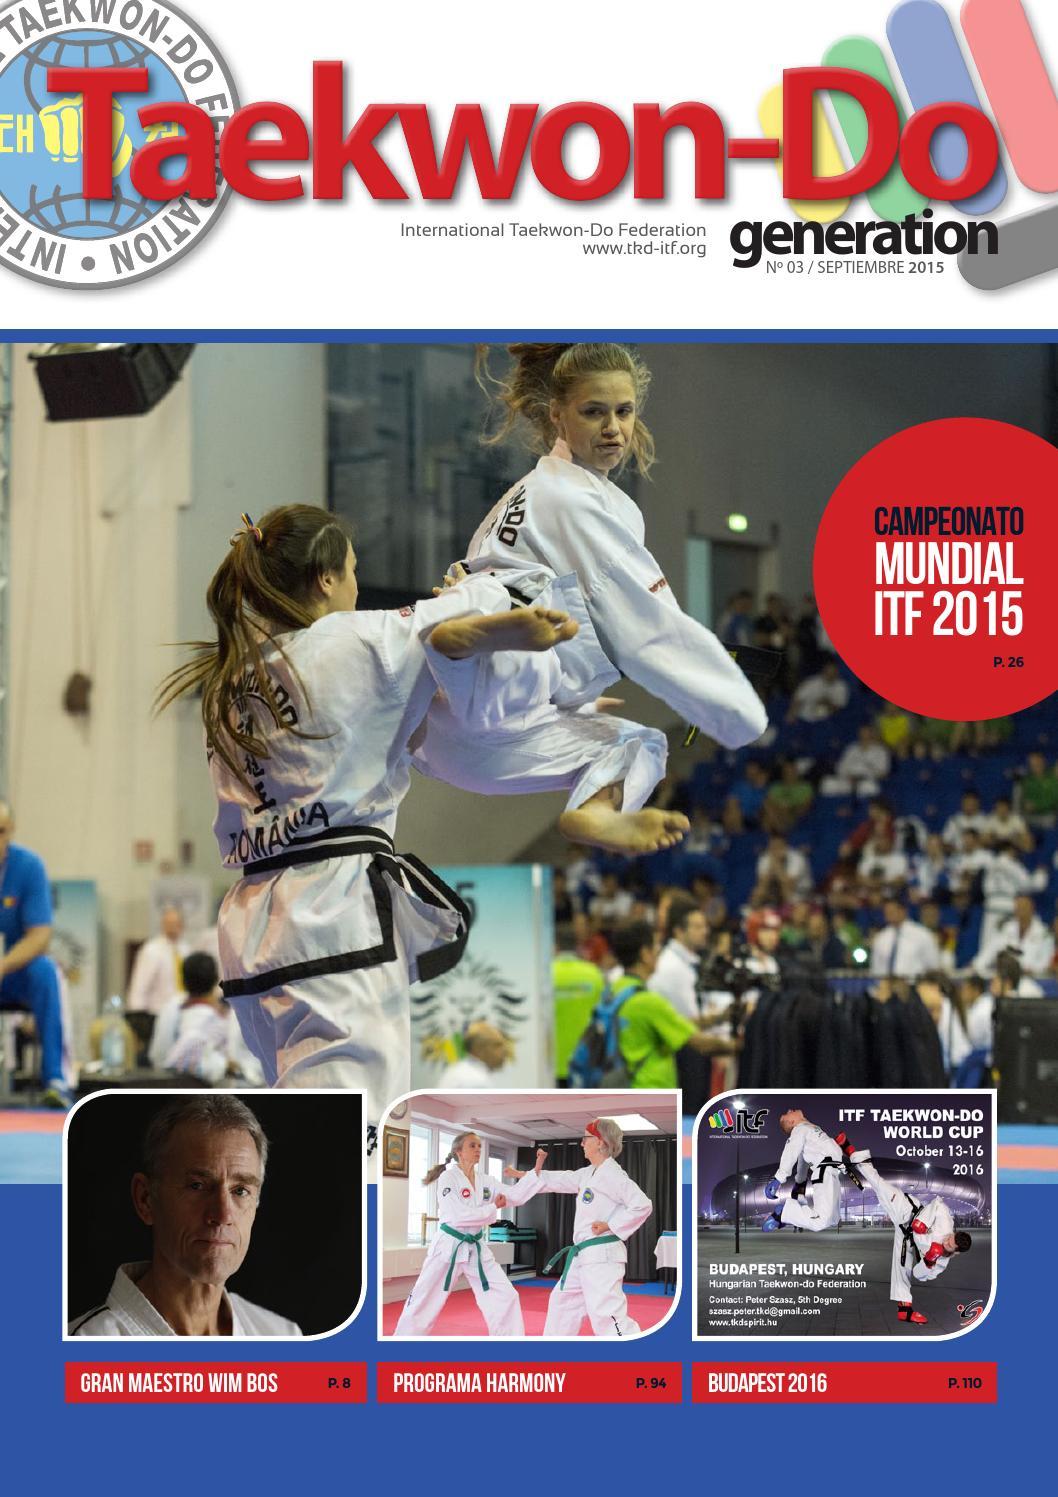 TAEKWON-DO GENERATION nº 03 by TKD ITF - issuu